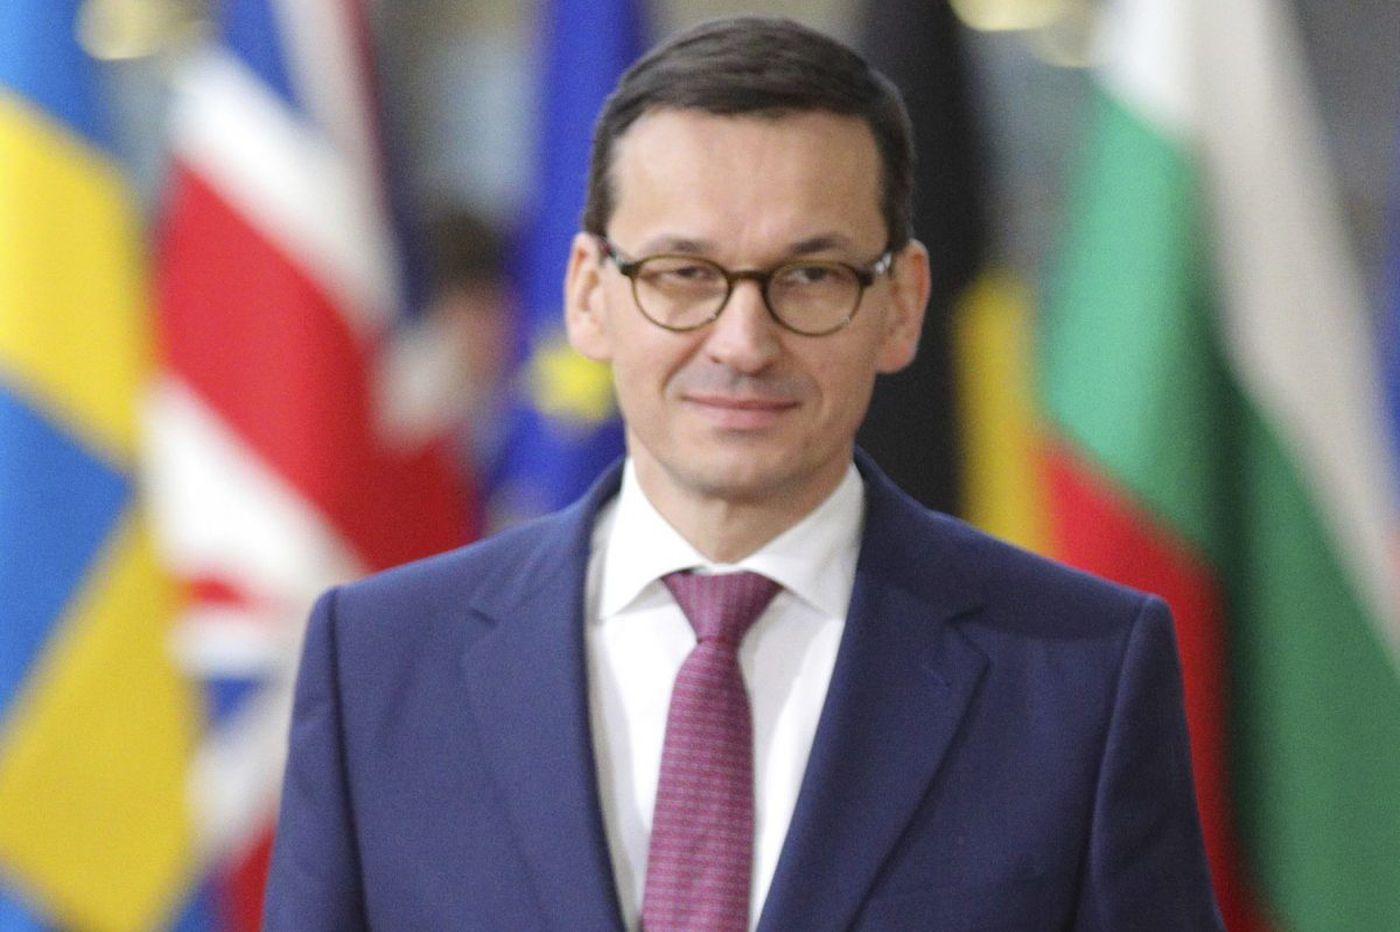 EU may sanction Poland, citing backslide of its democracy